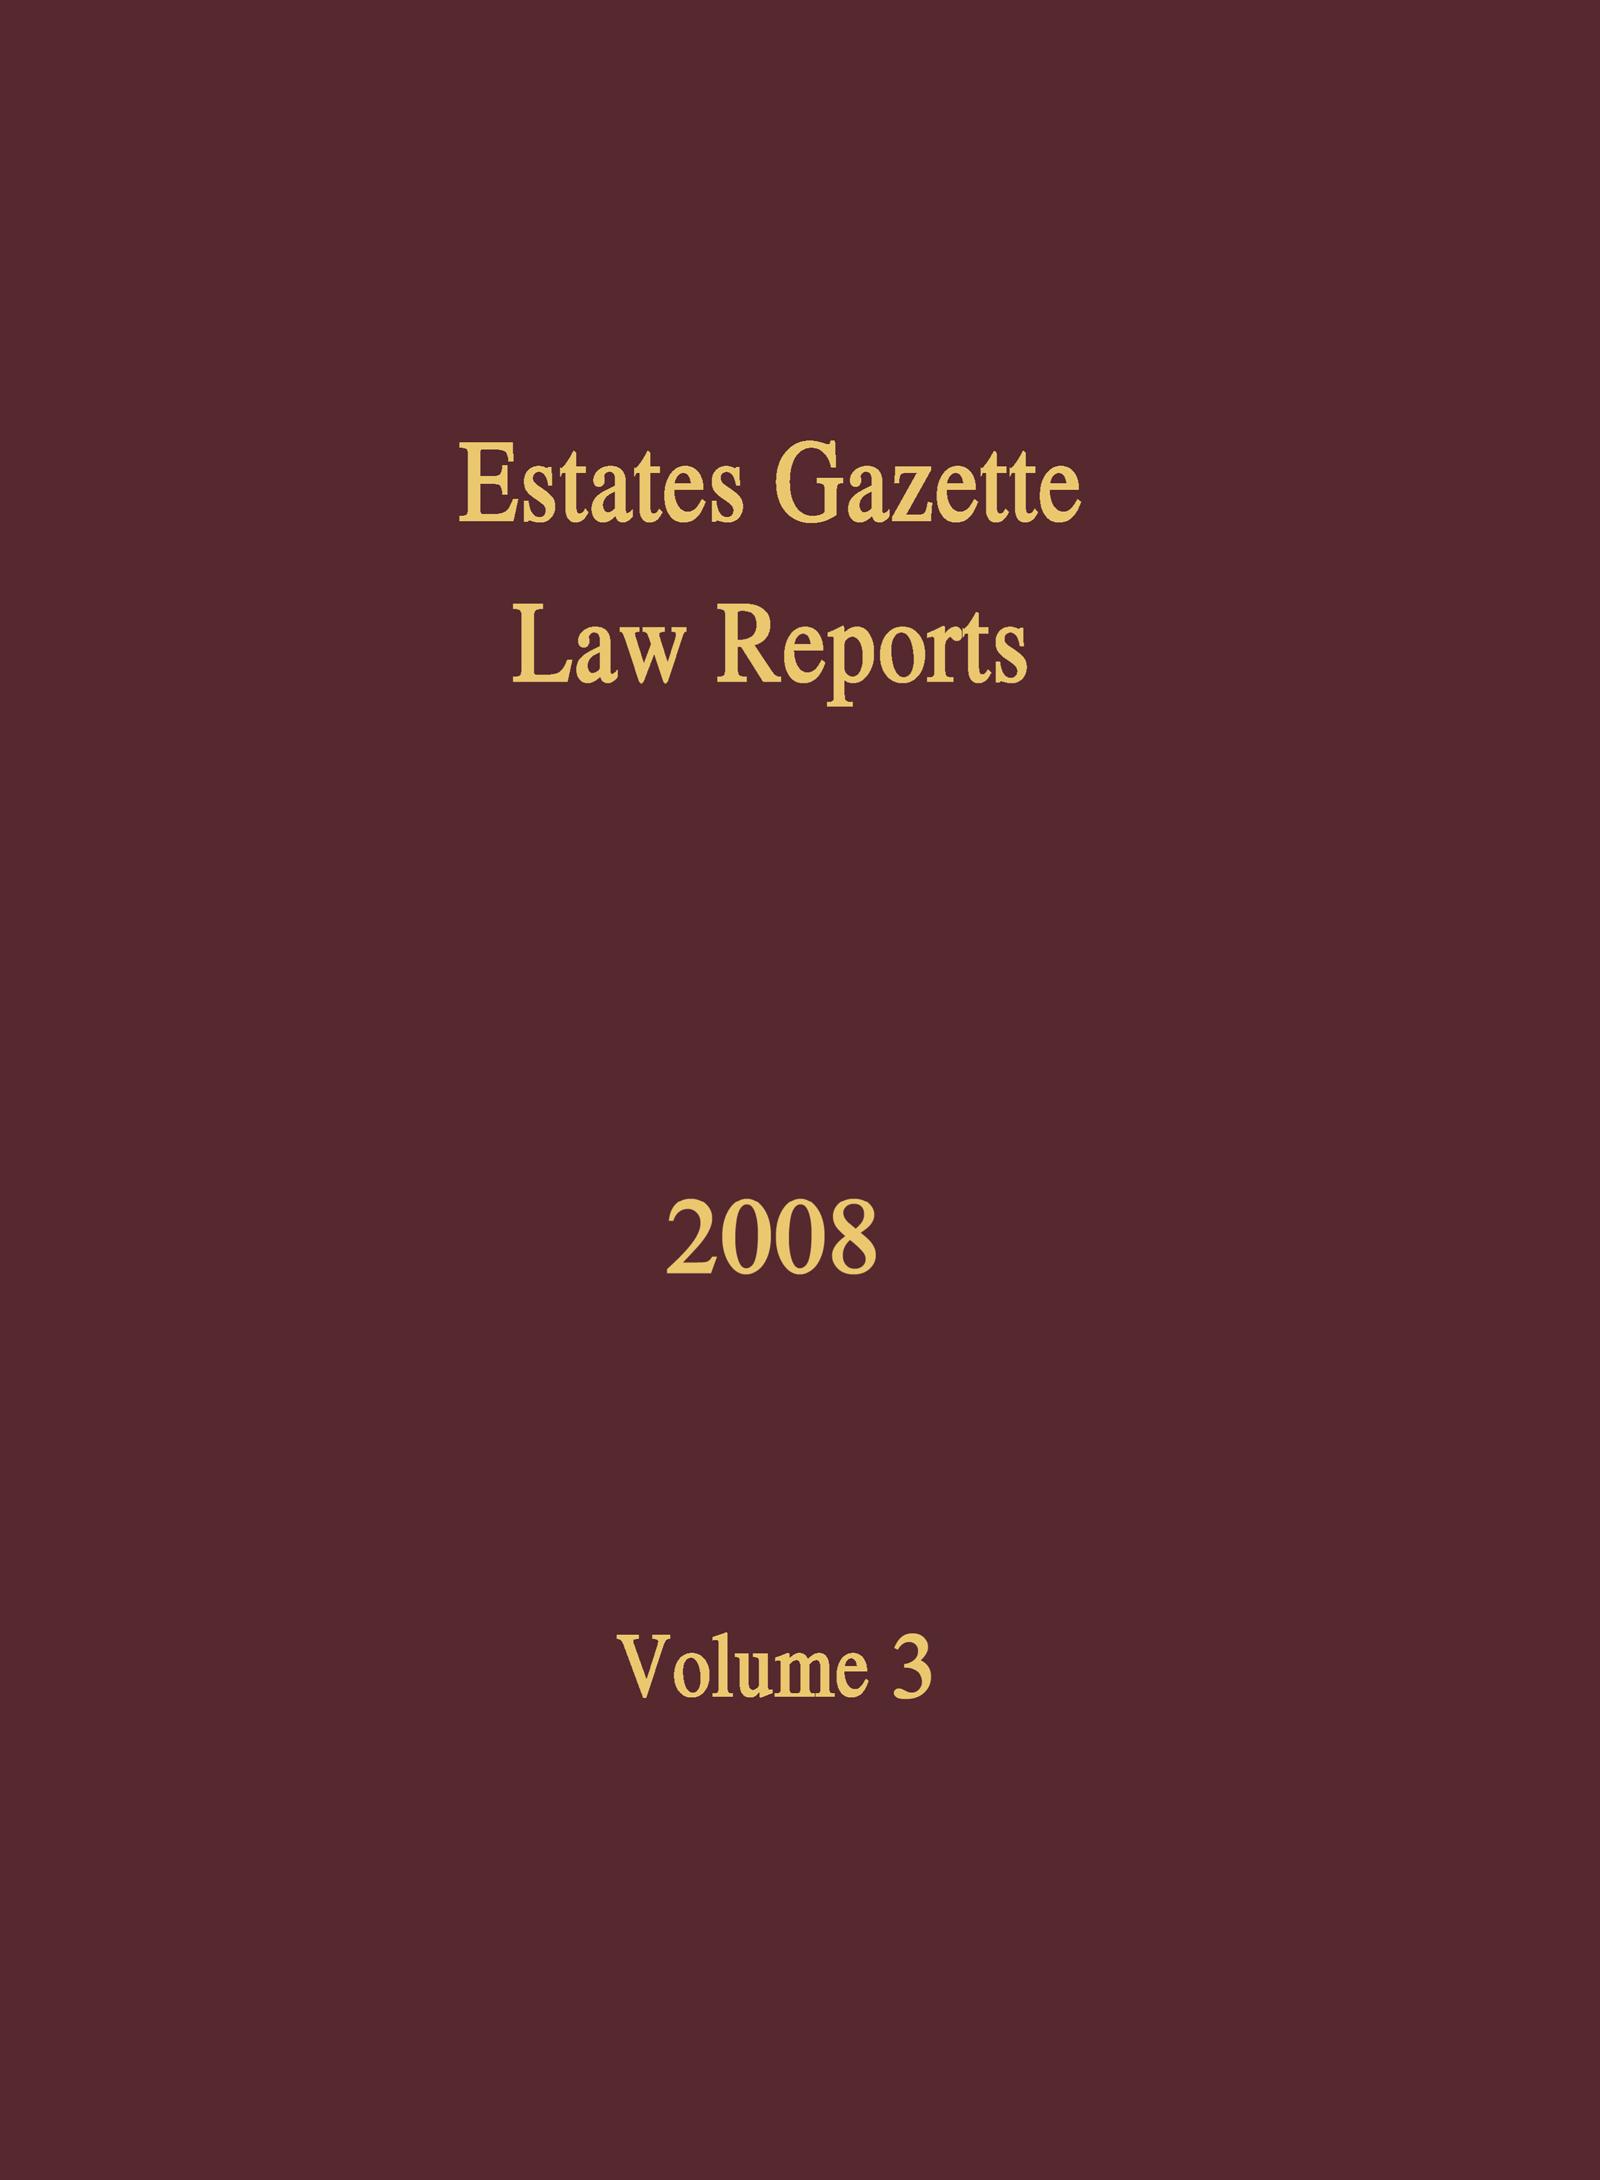 EGLR 2008 Volume 3